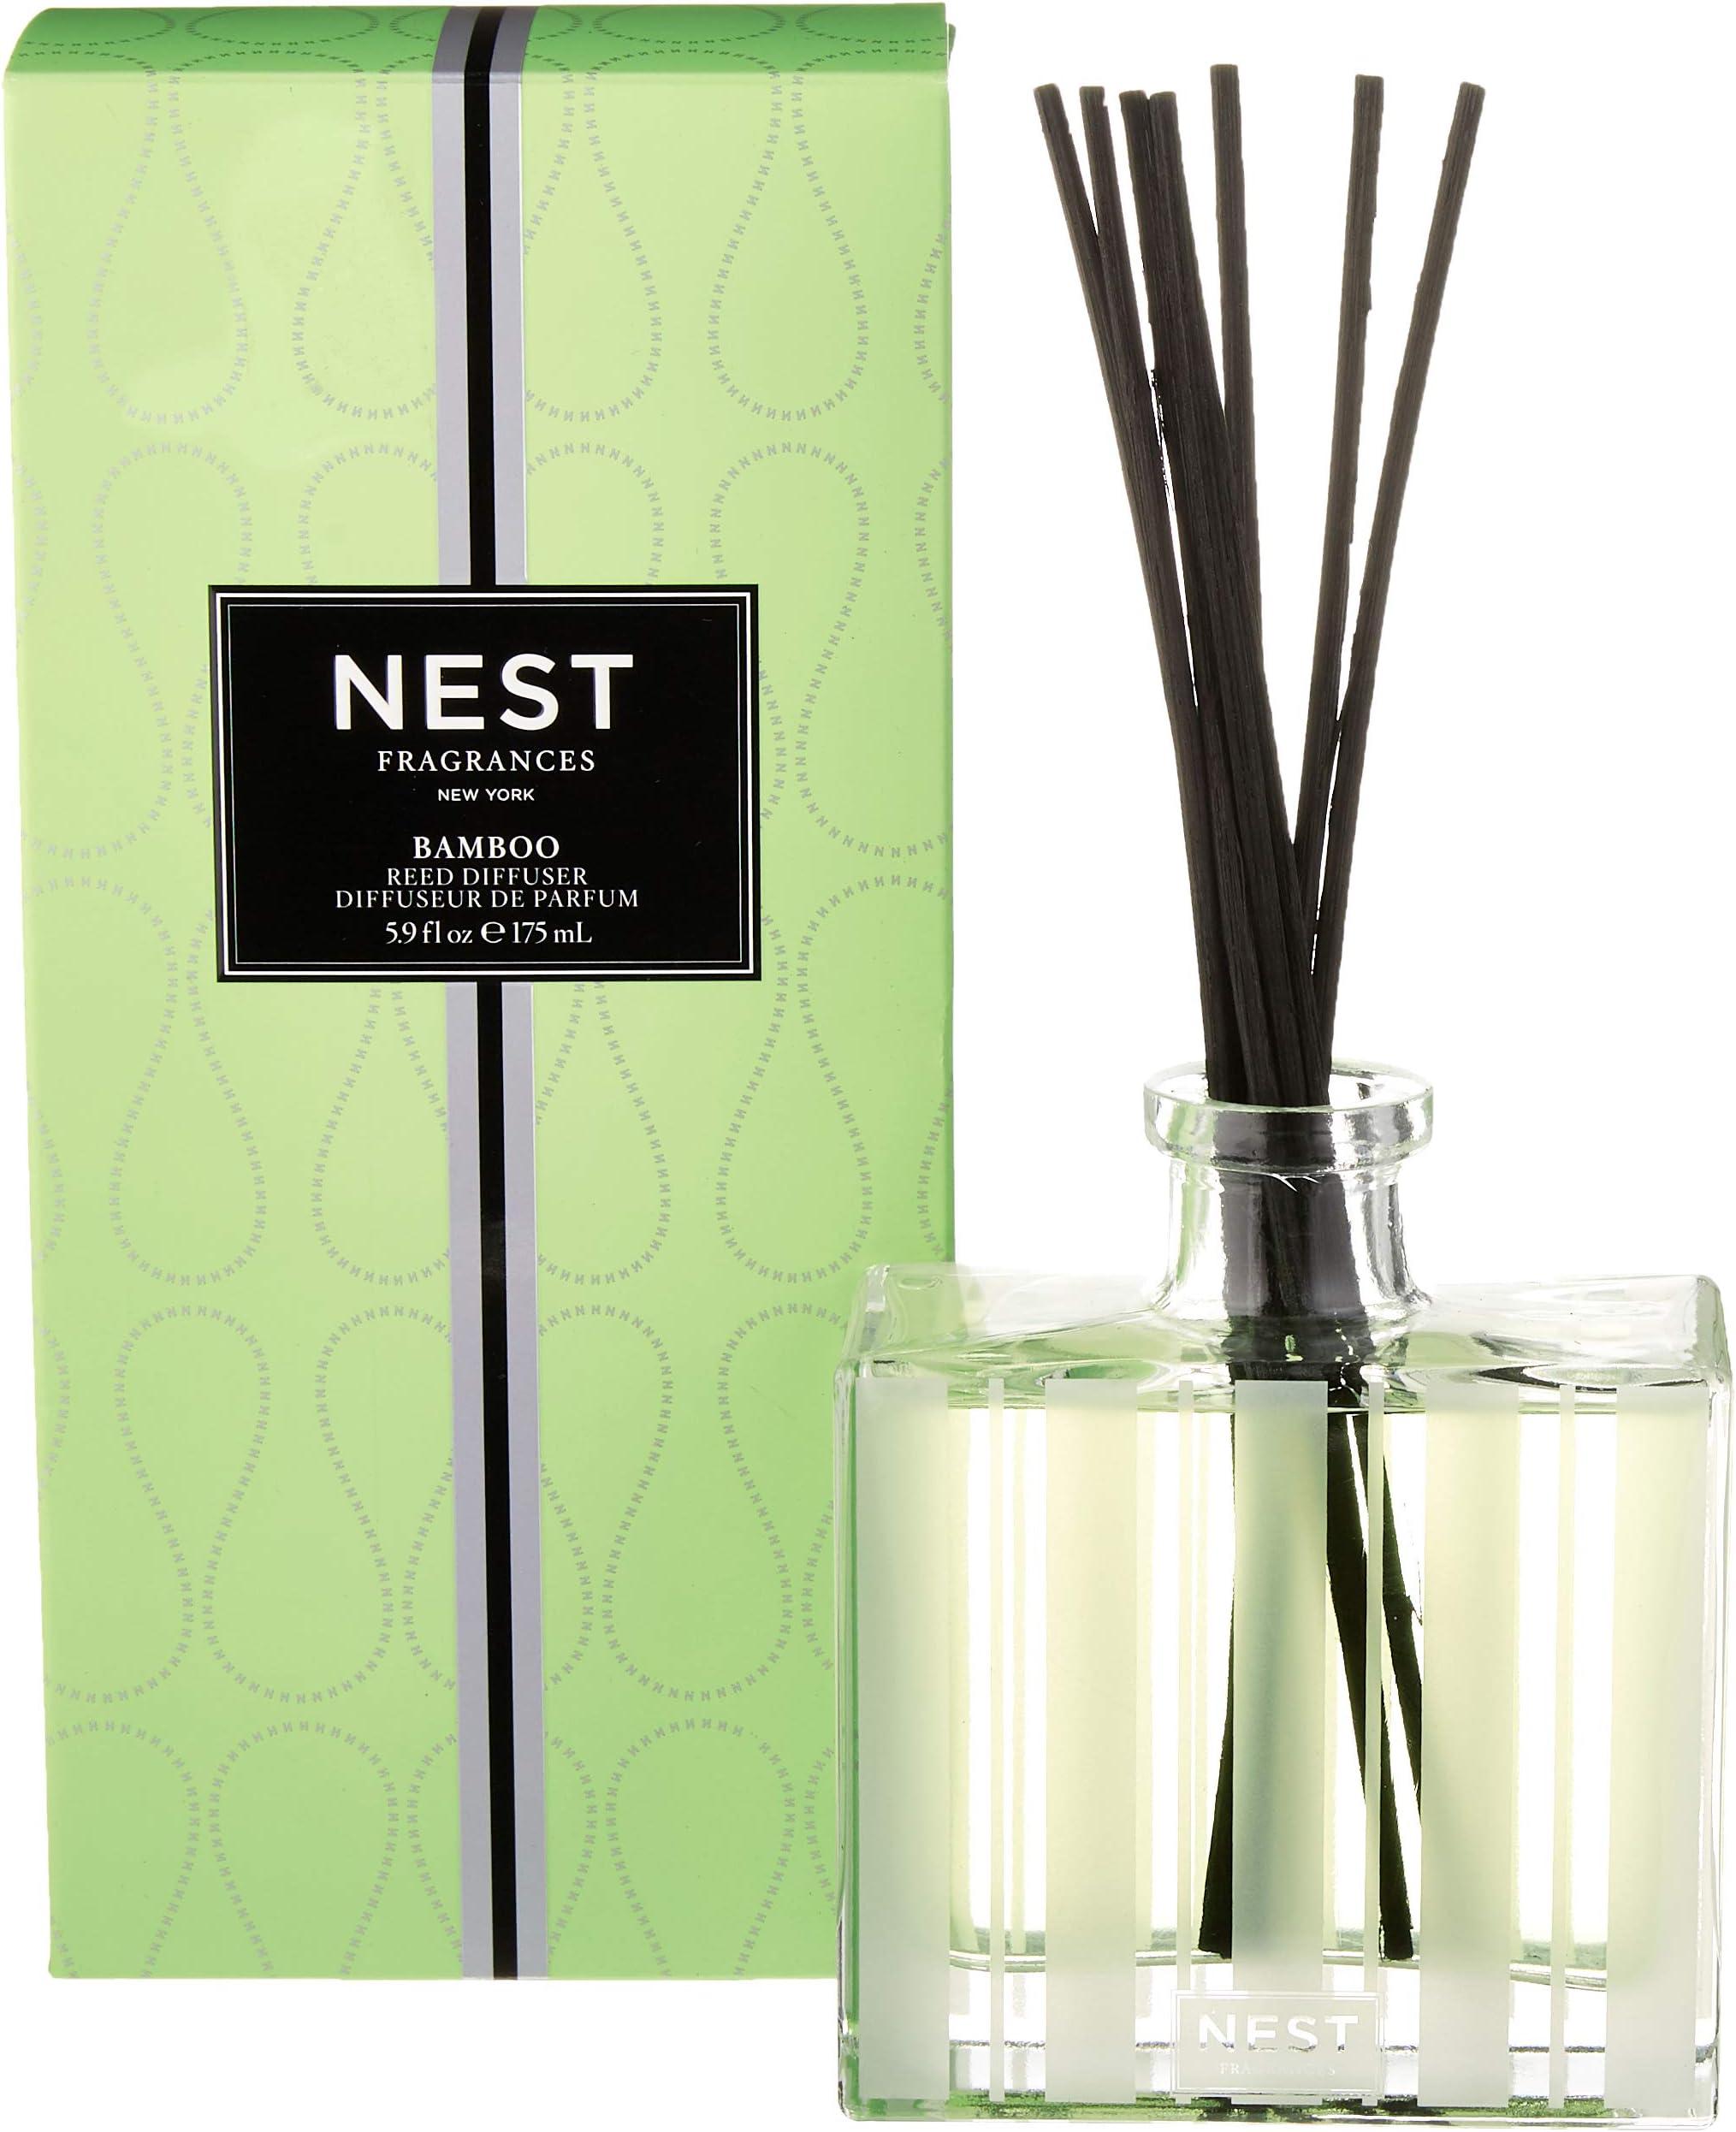 NEST Fragrances Reed Diffuser- Bamboo , 5.9 fl oz